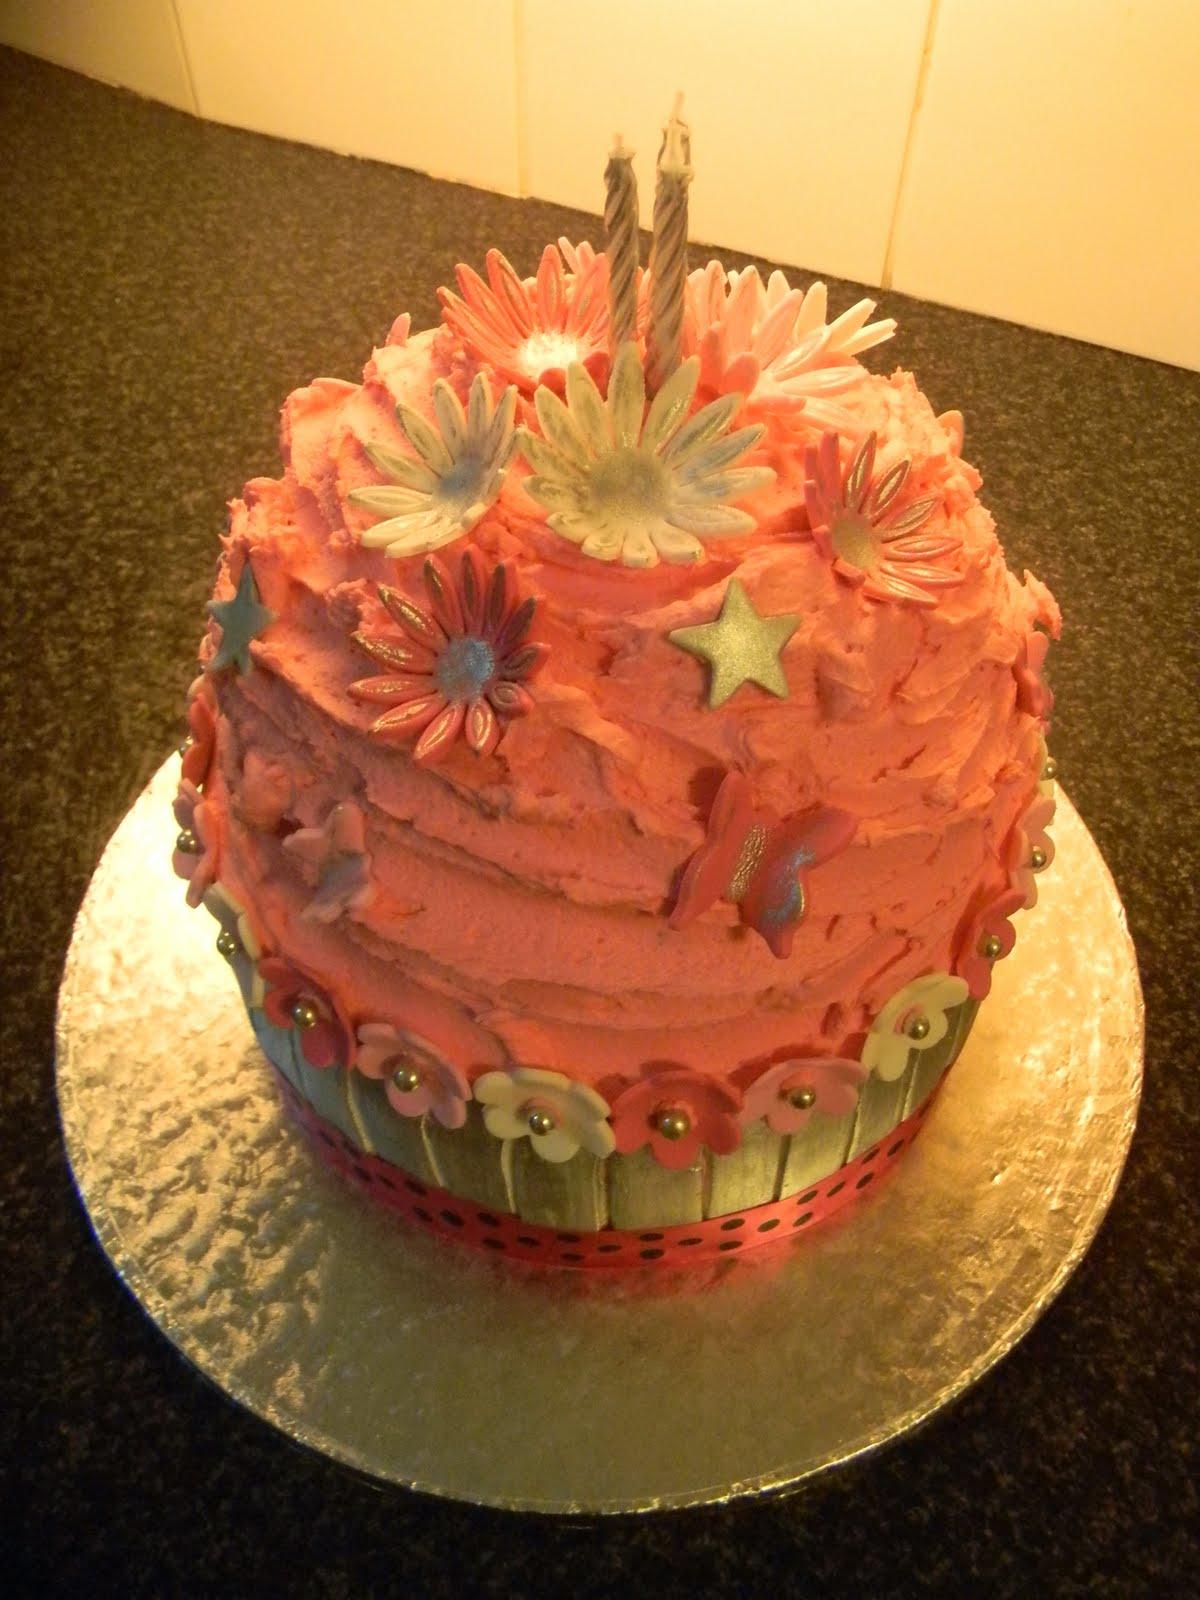 Birthday Cake Pics With Name Ali : Ali s Cakes: Giant Cupcake Birthday Cake